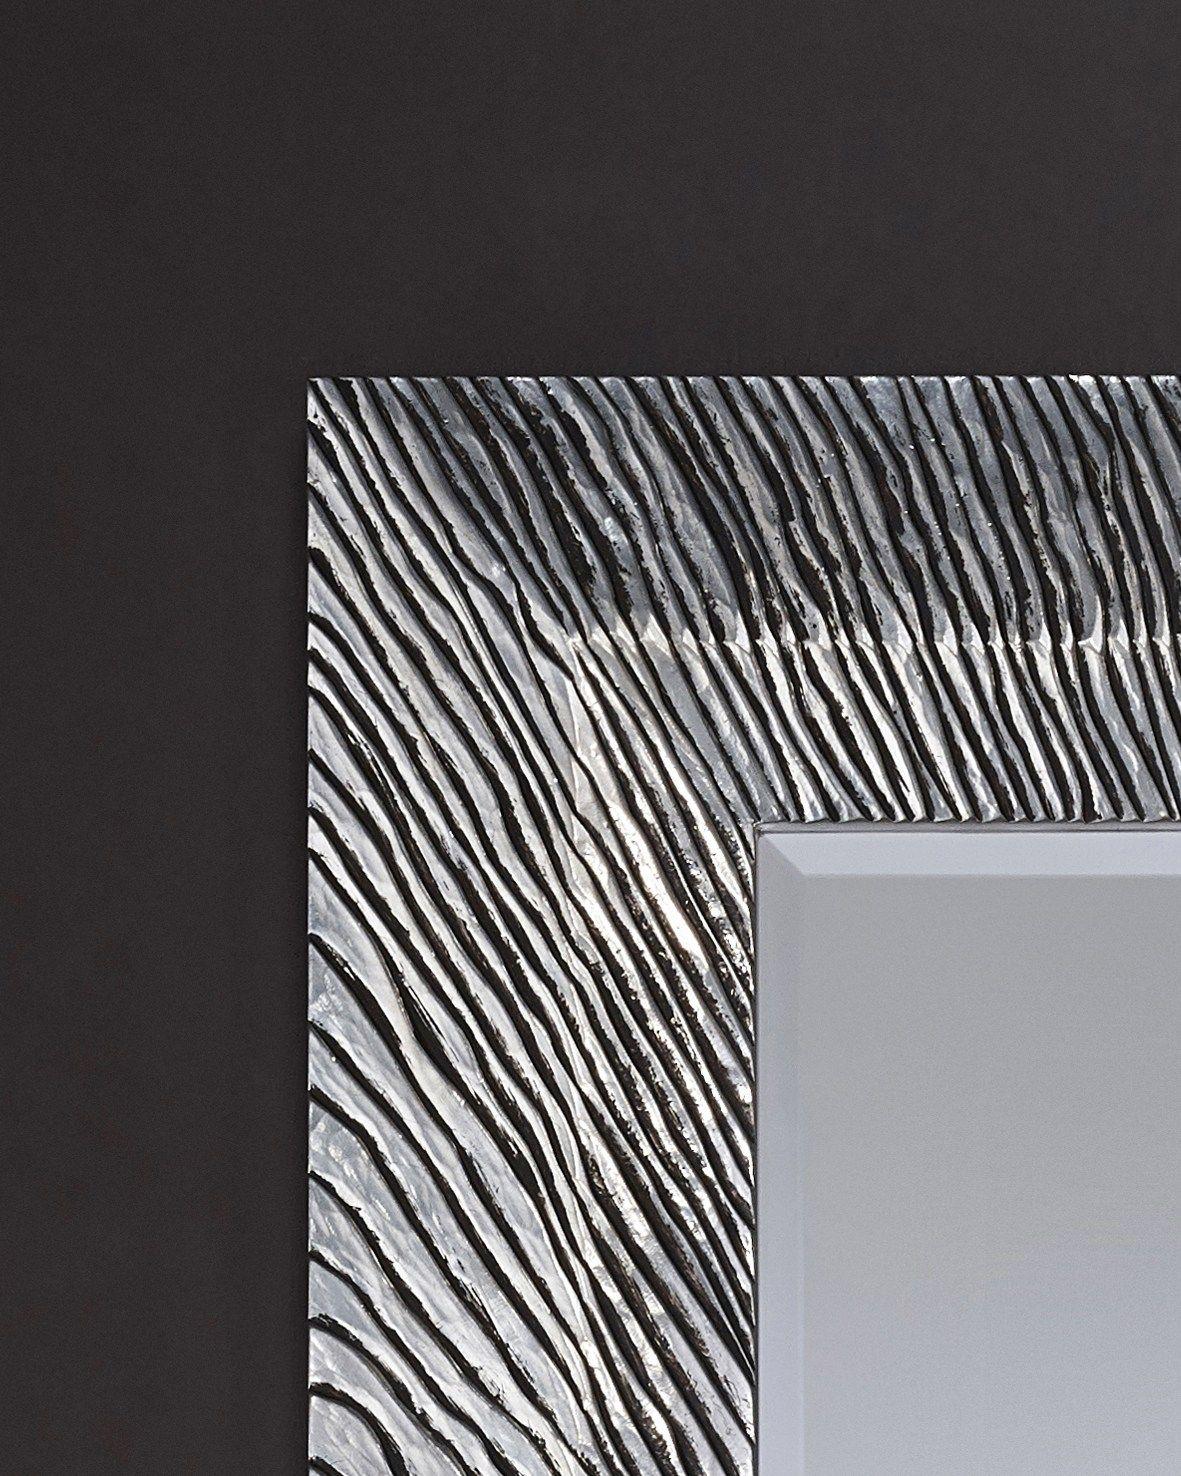 Groove miroir art d co by deknudt mirrors for Miroir art deco